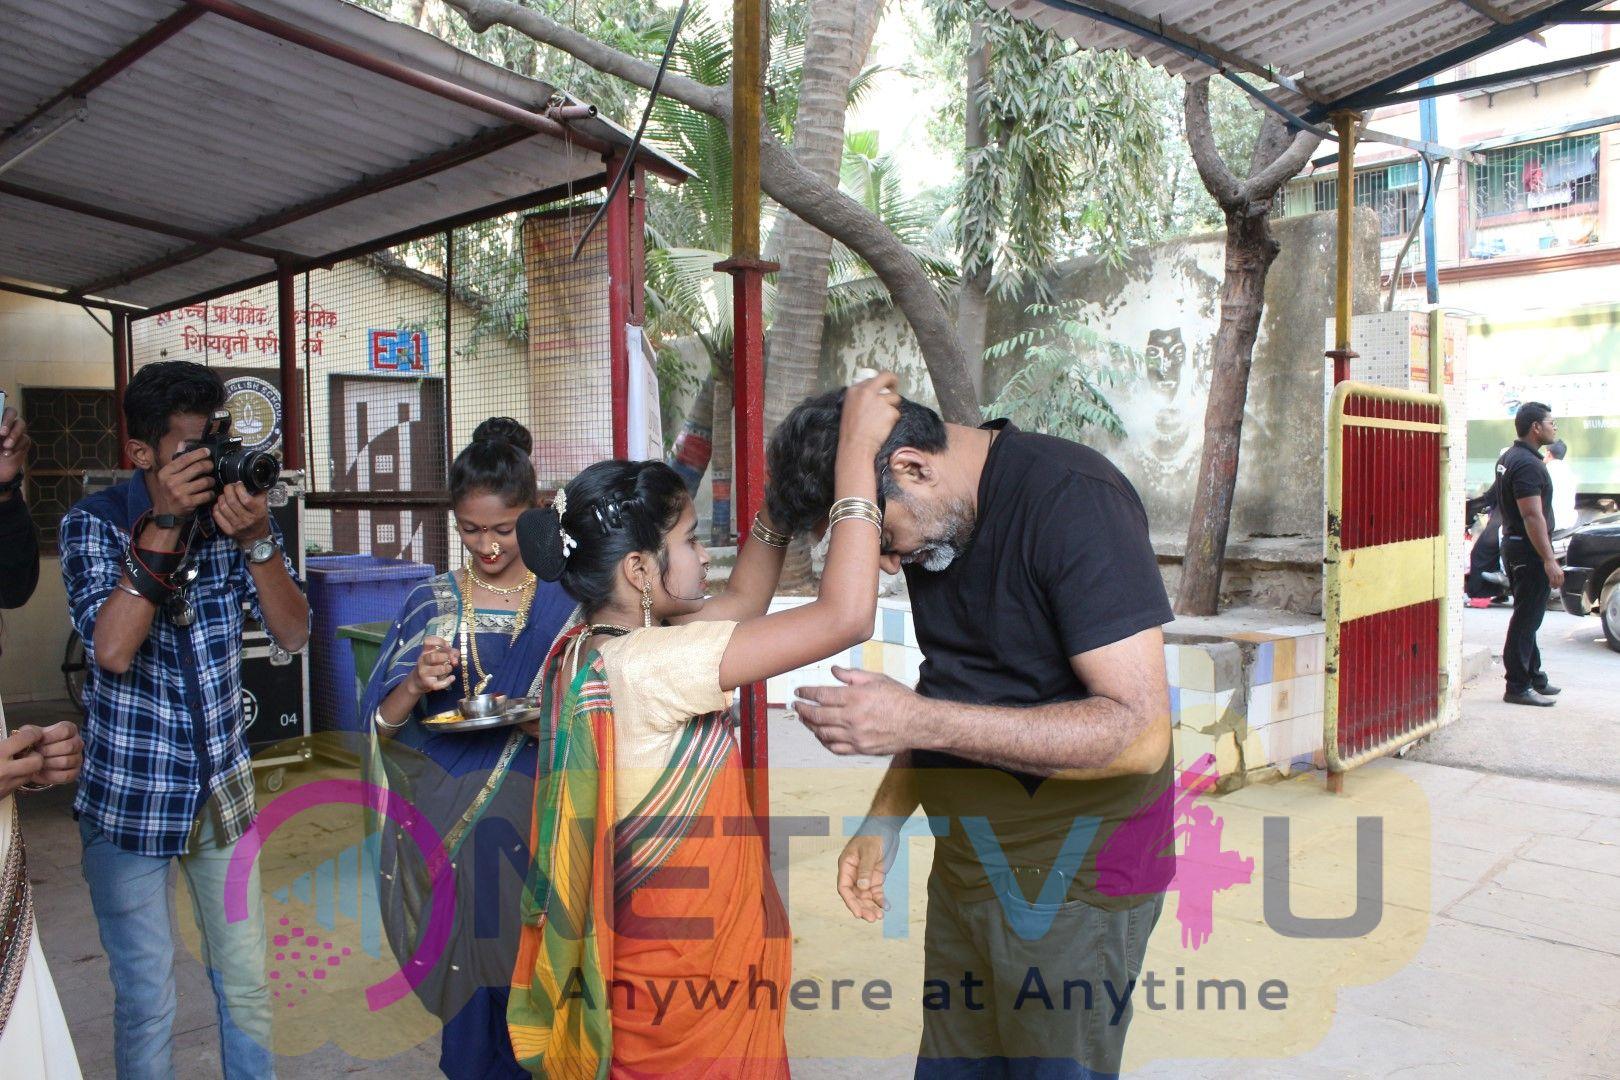 Sonam Kapoor & R Balki Promotion Of Padman With Children Stills